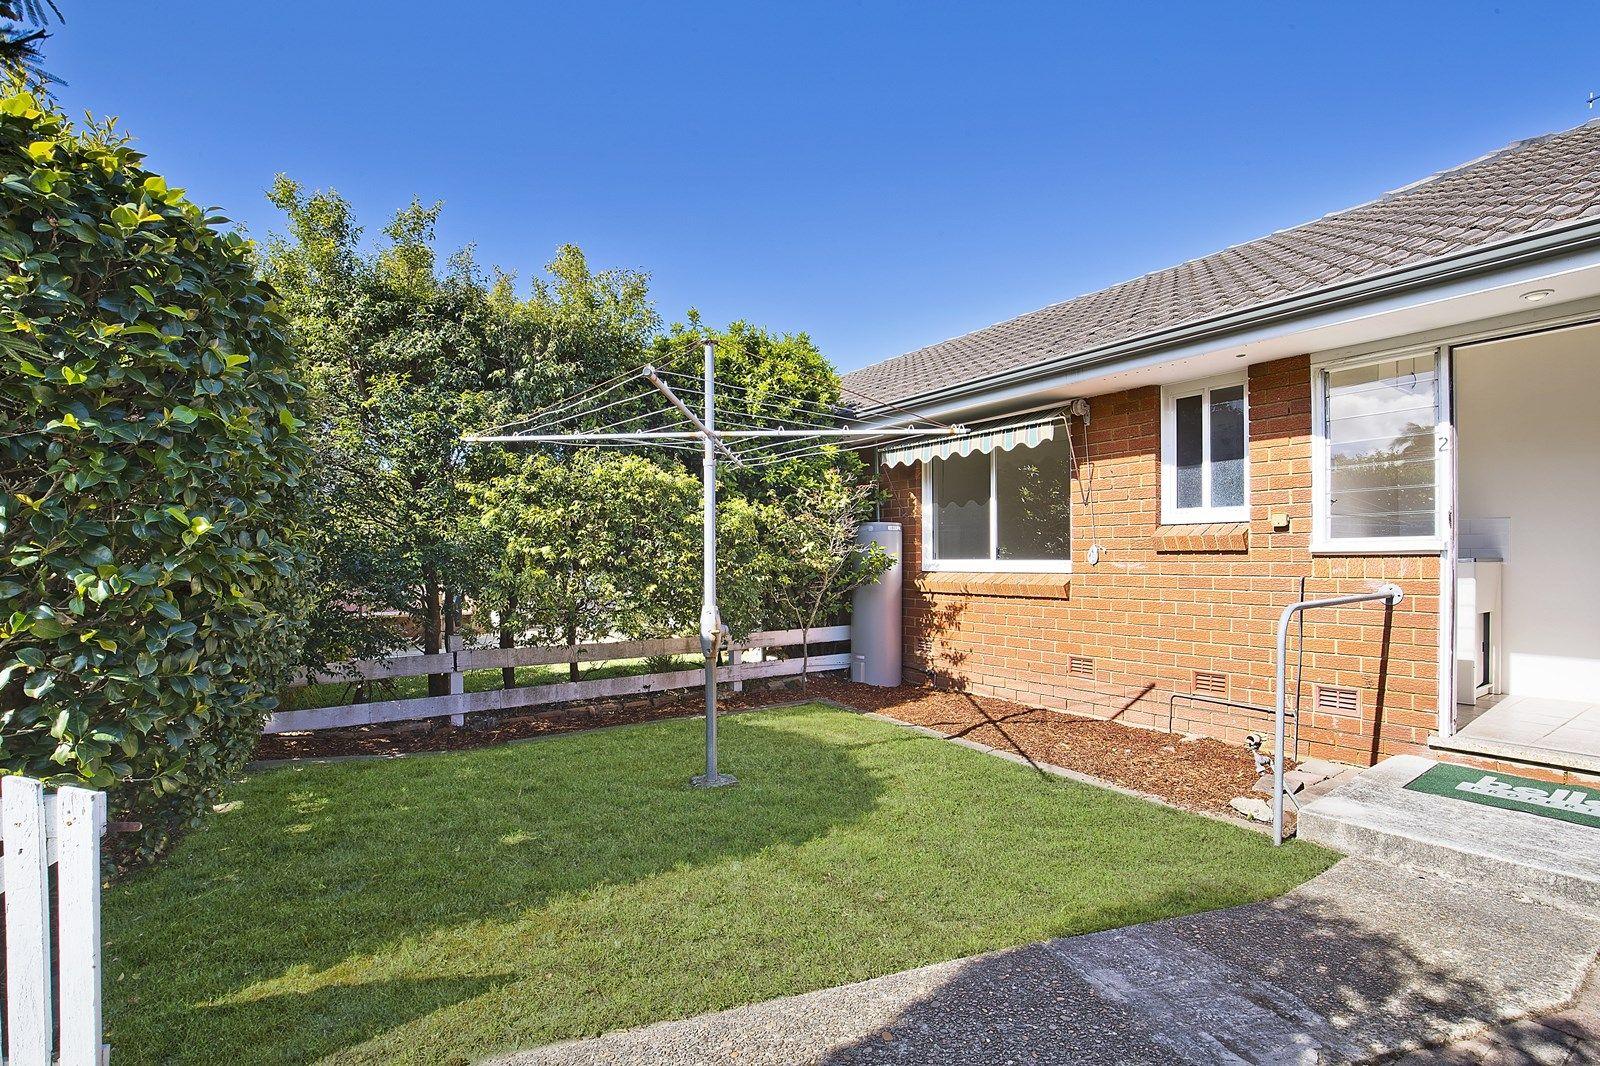 2/71 Hilma Street, Collaroy Plateau NSW 2097, Image 2